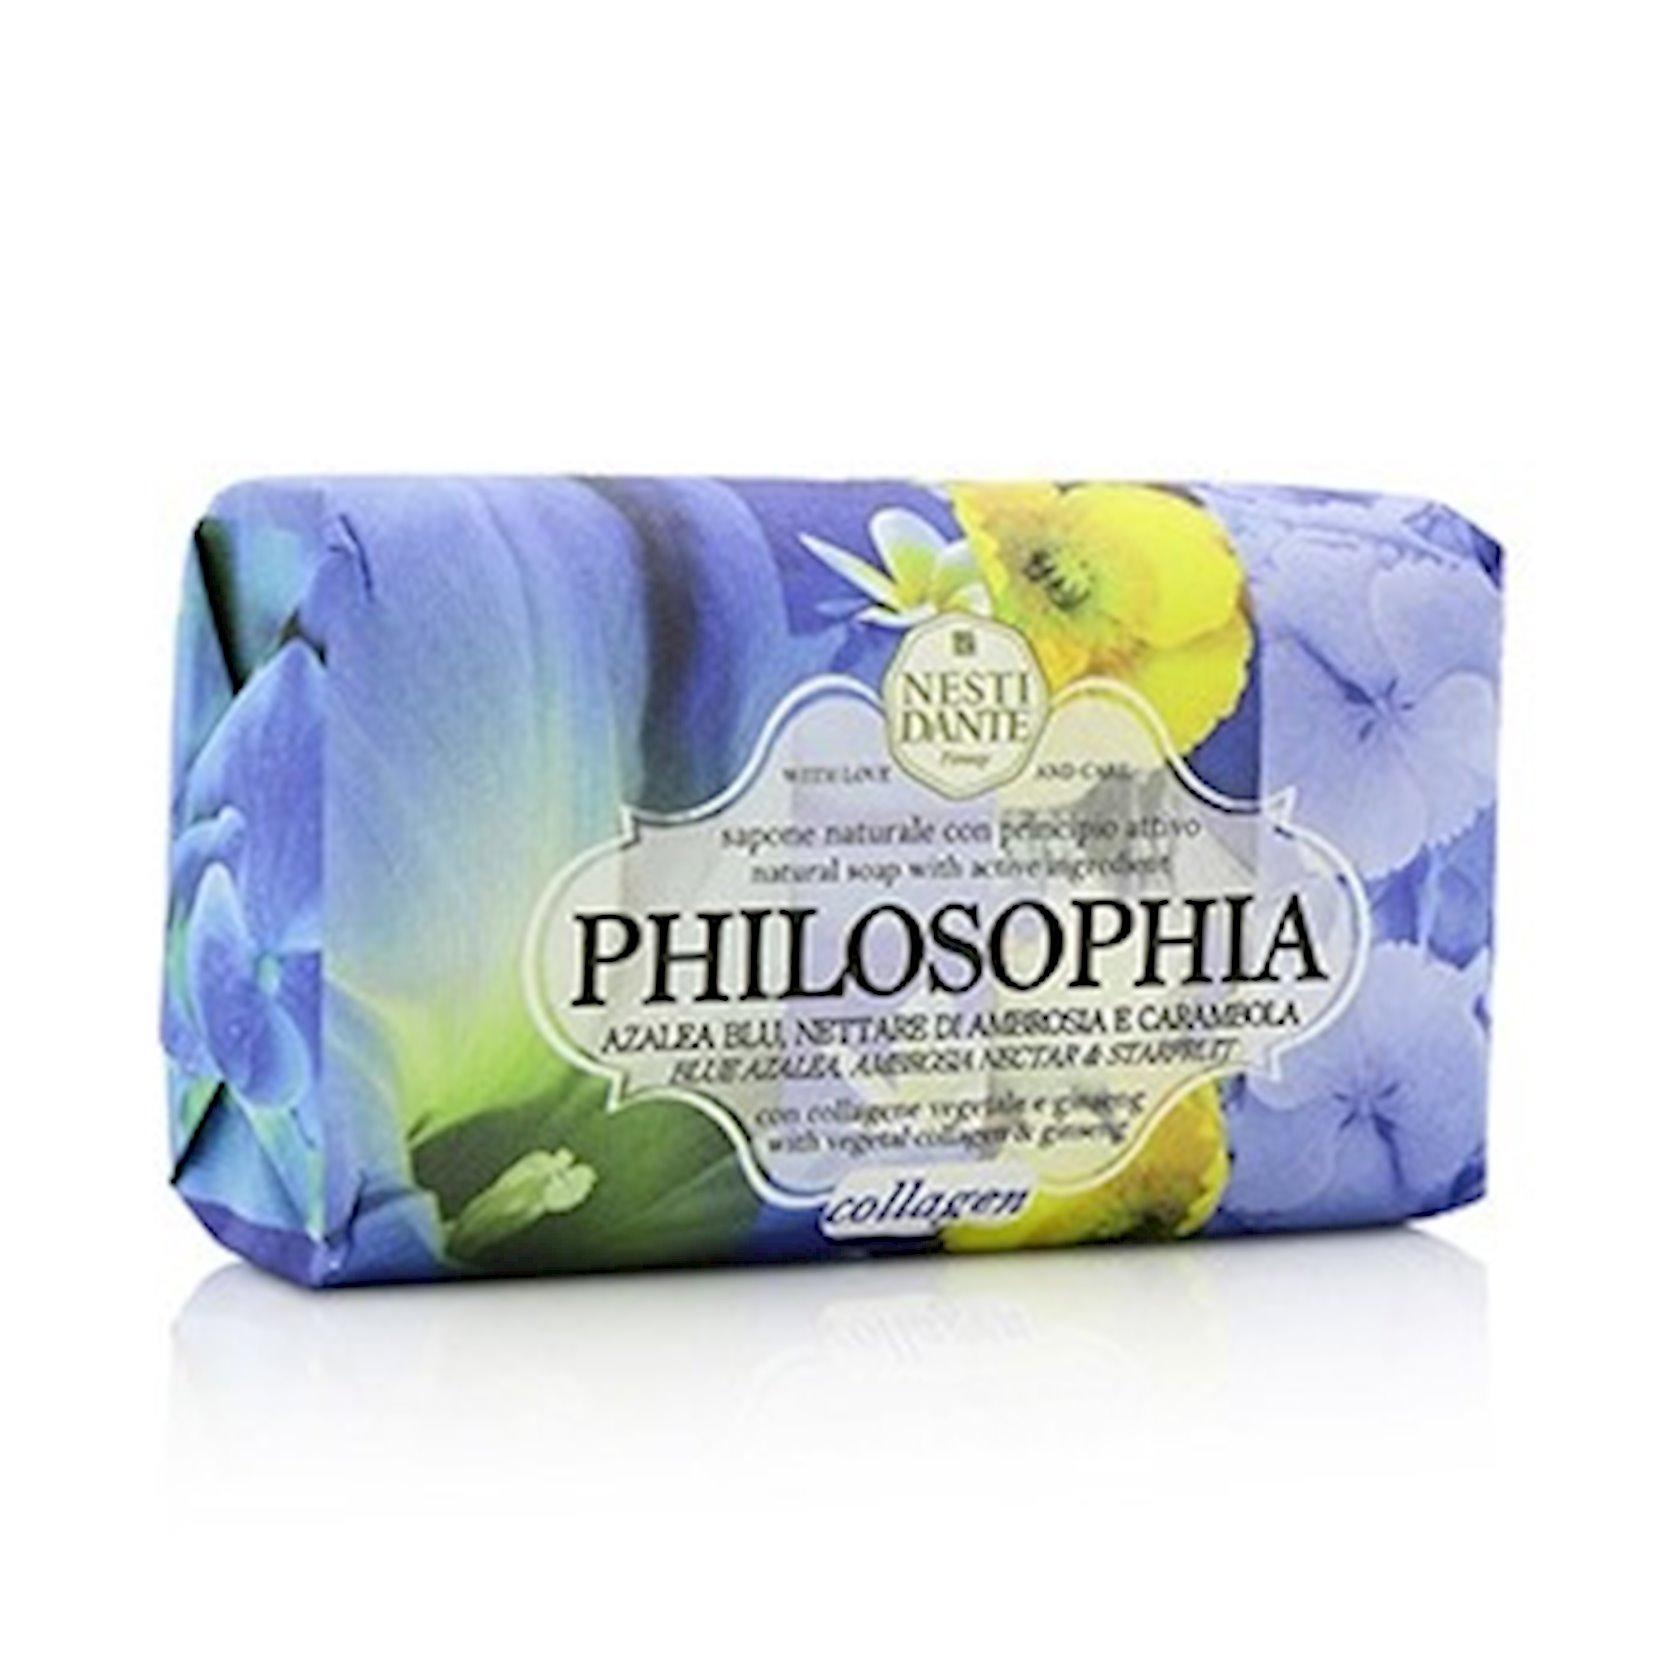 Sabun Nesti Dante Philosophia Collagen 250 q